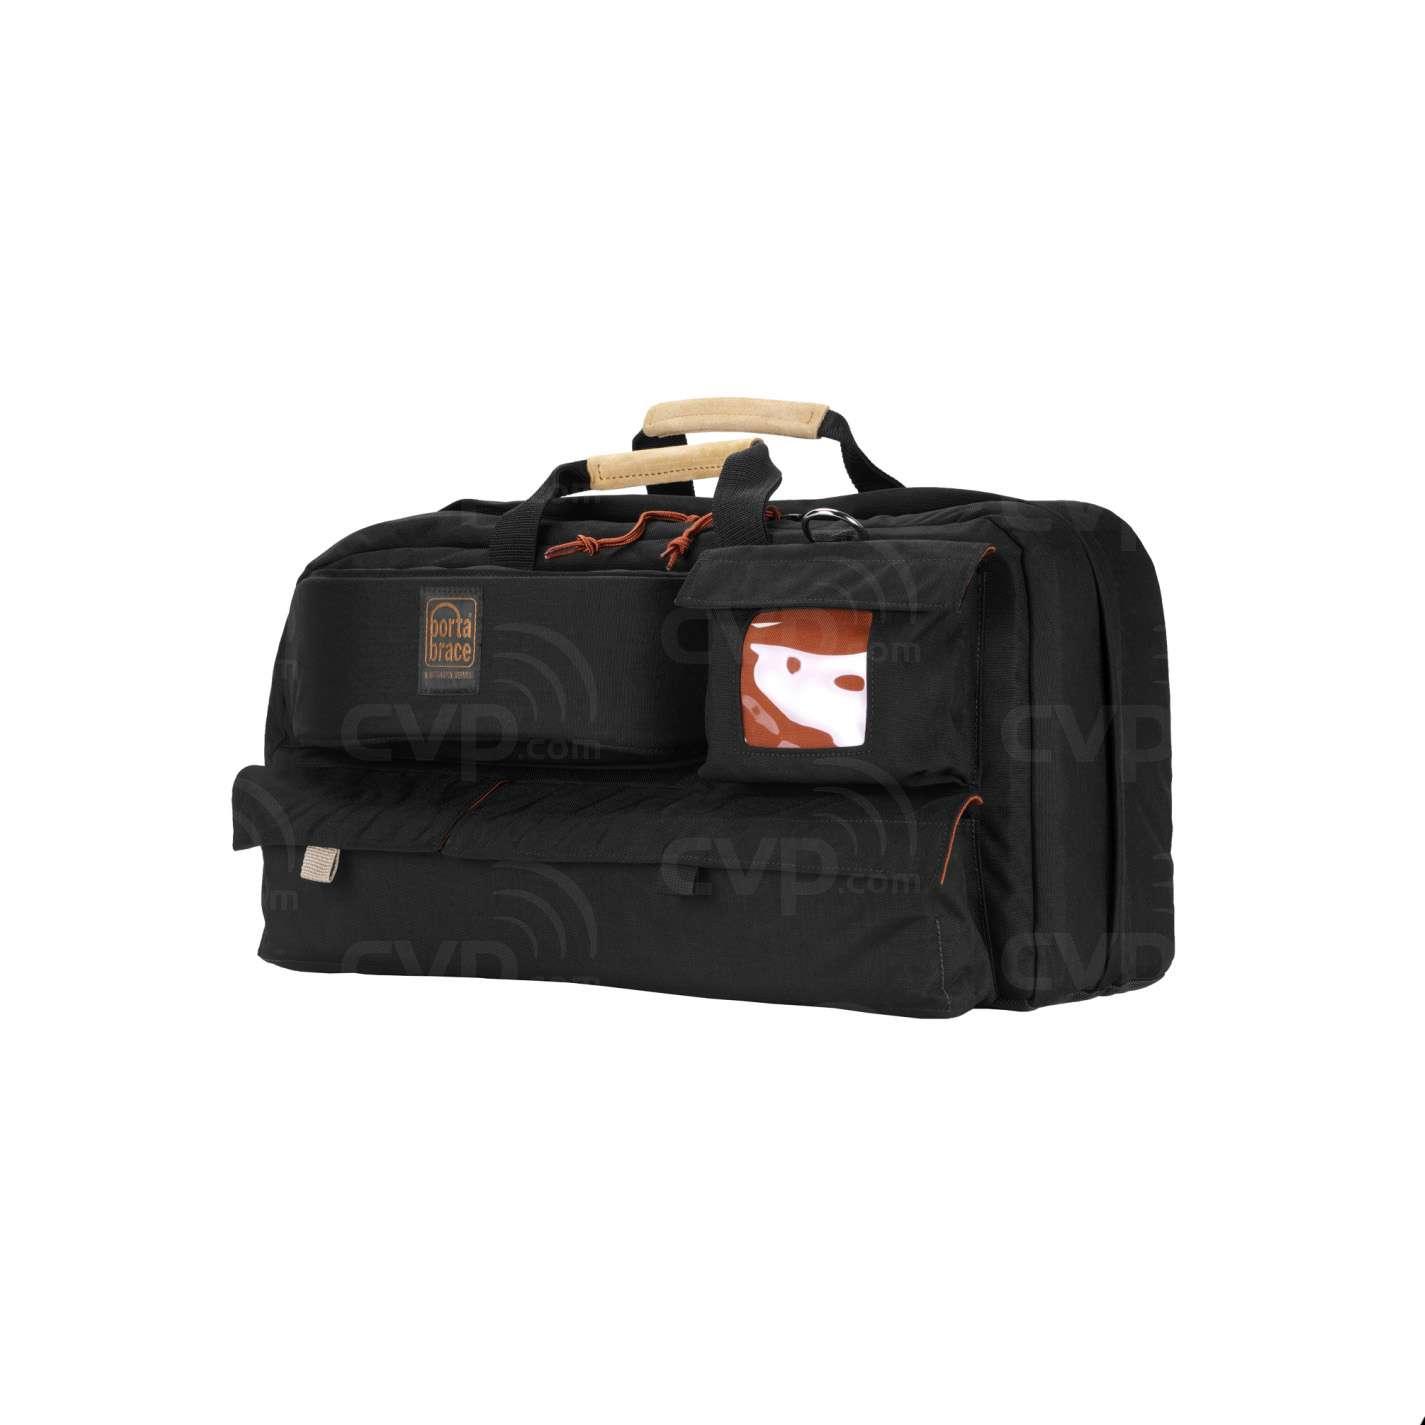 Portabrace CTC-URSAMINI (CTCURSAMINI) Camera Traveler Case